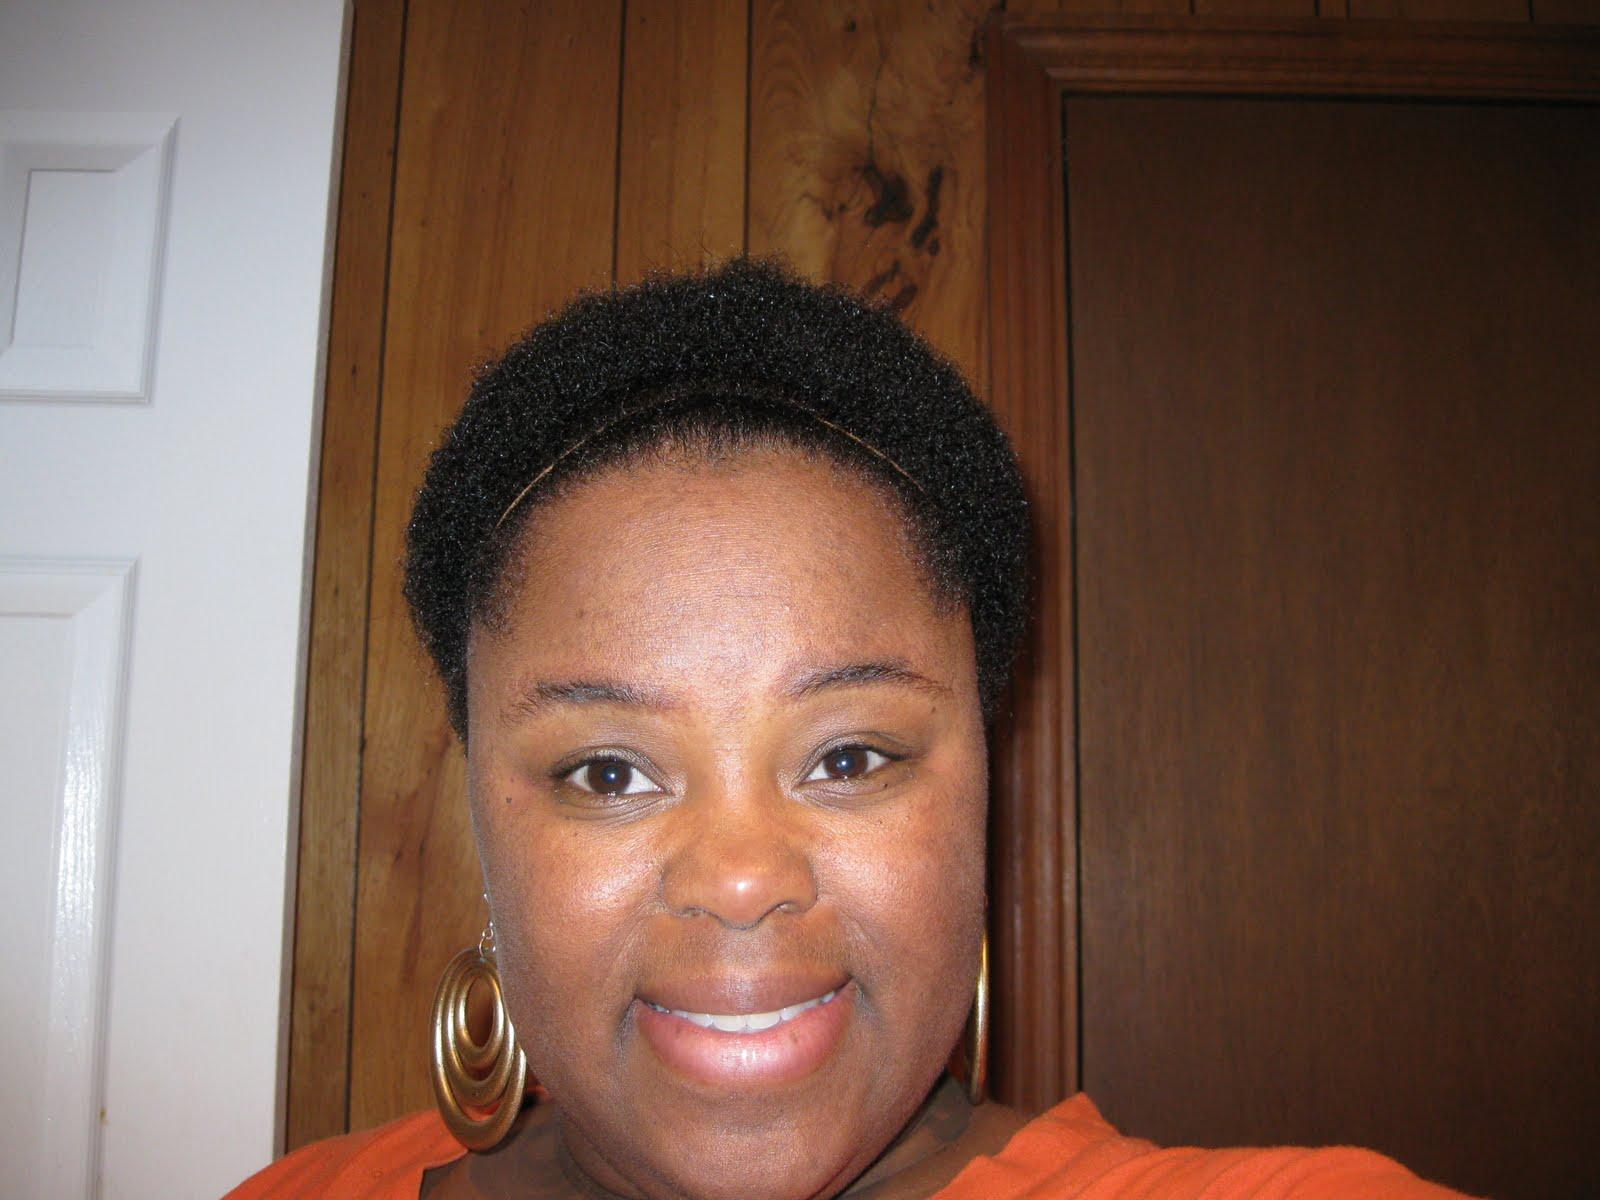 Hair Growth After Big Chop